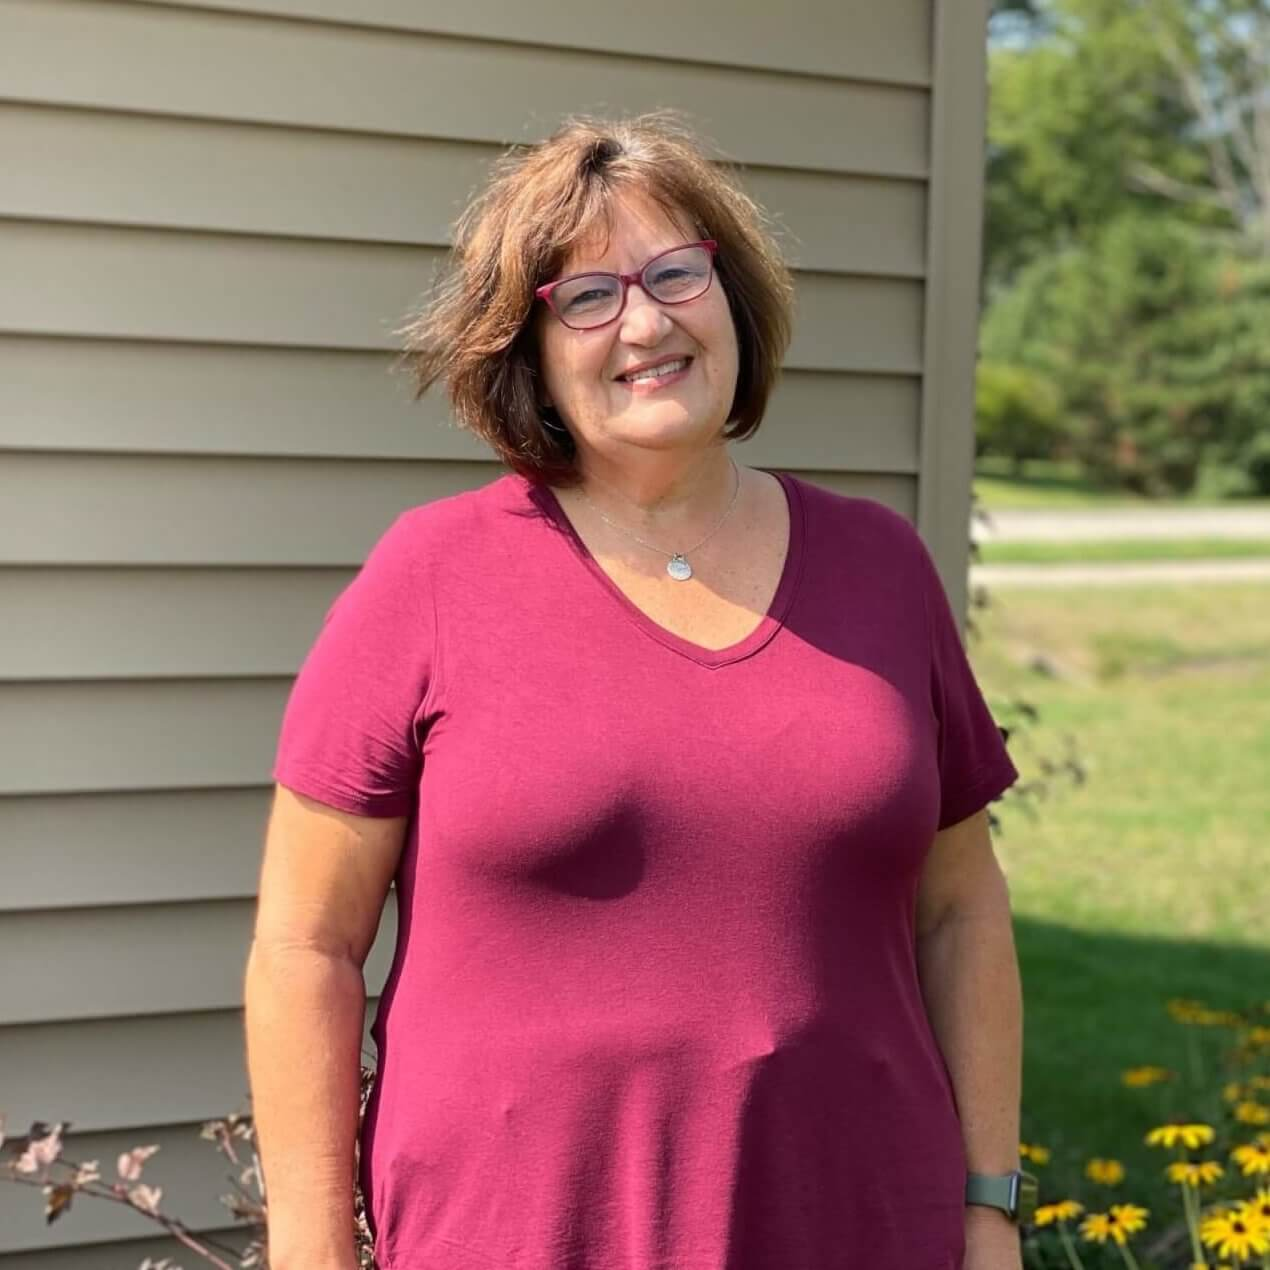 Julie Antioho